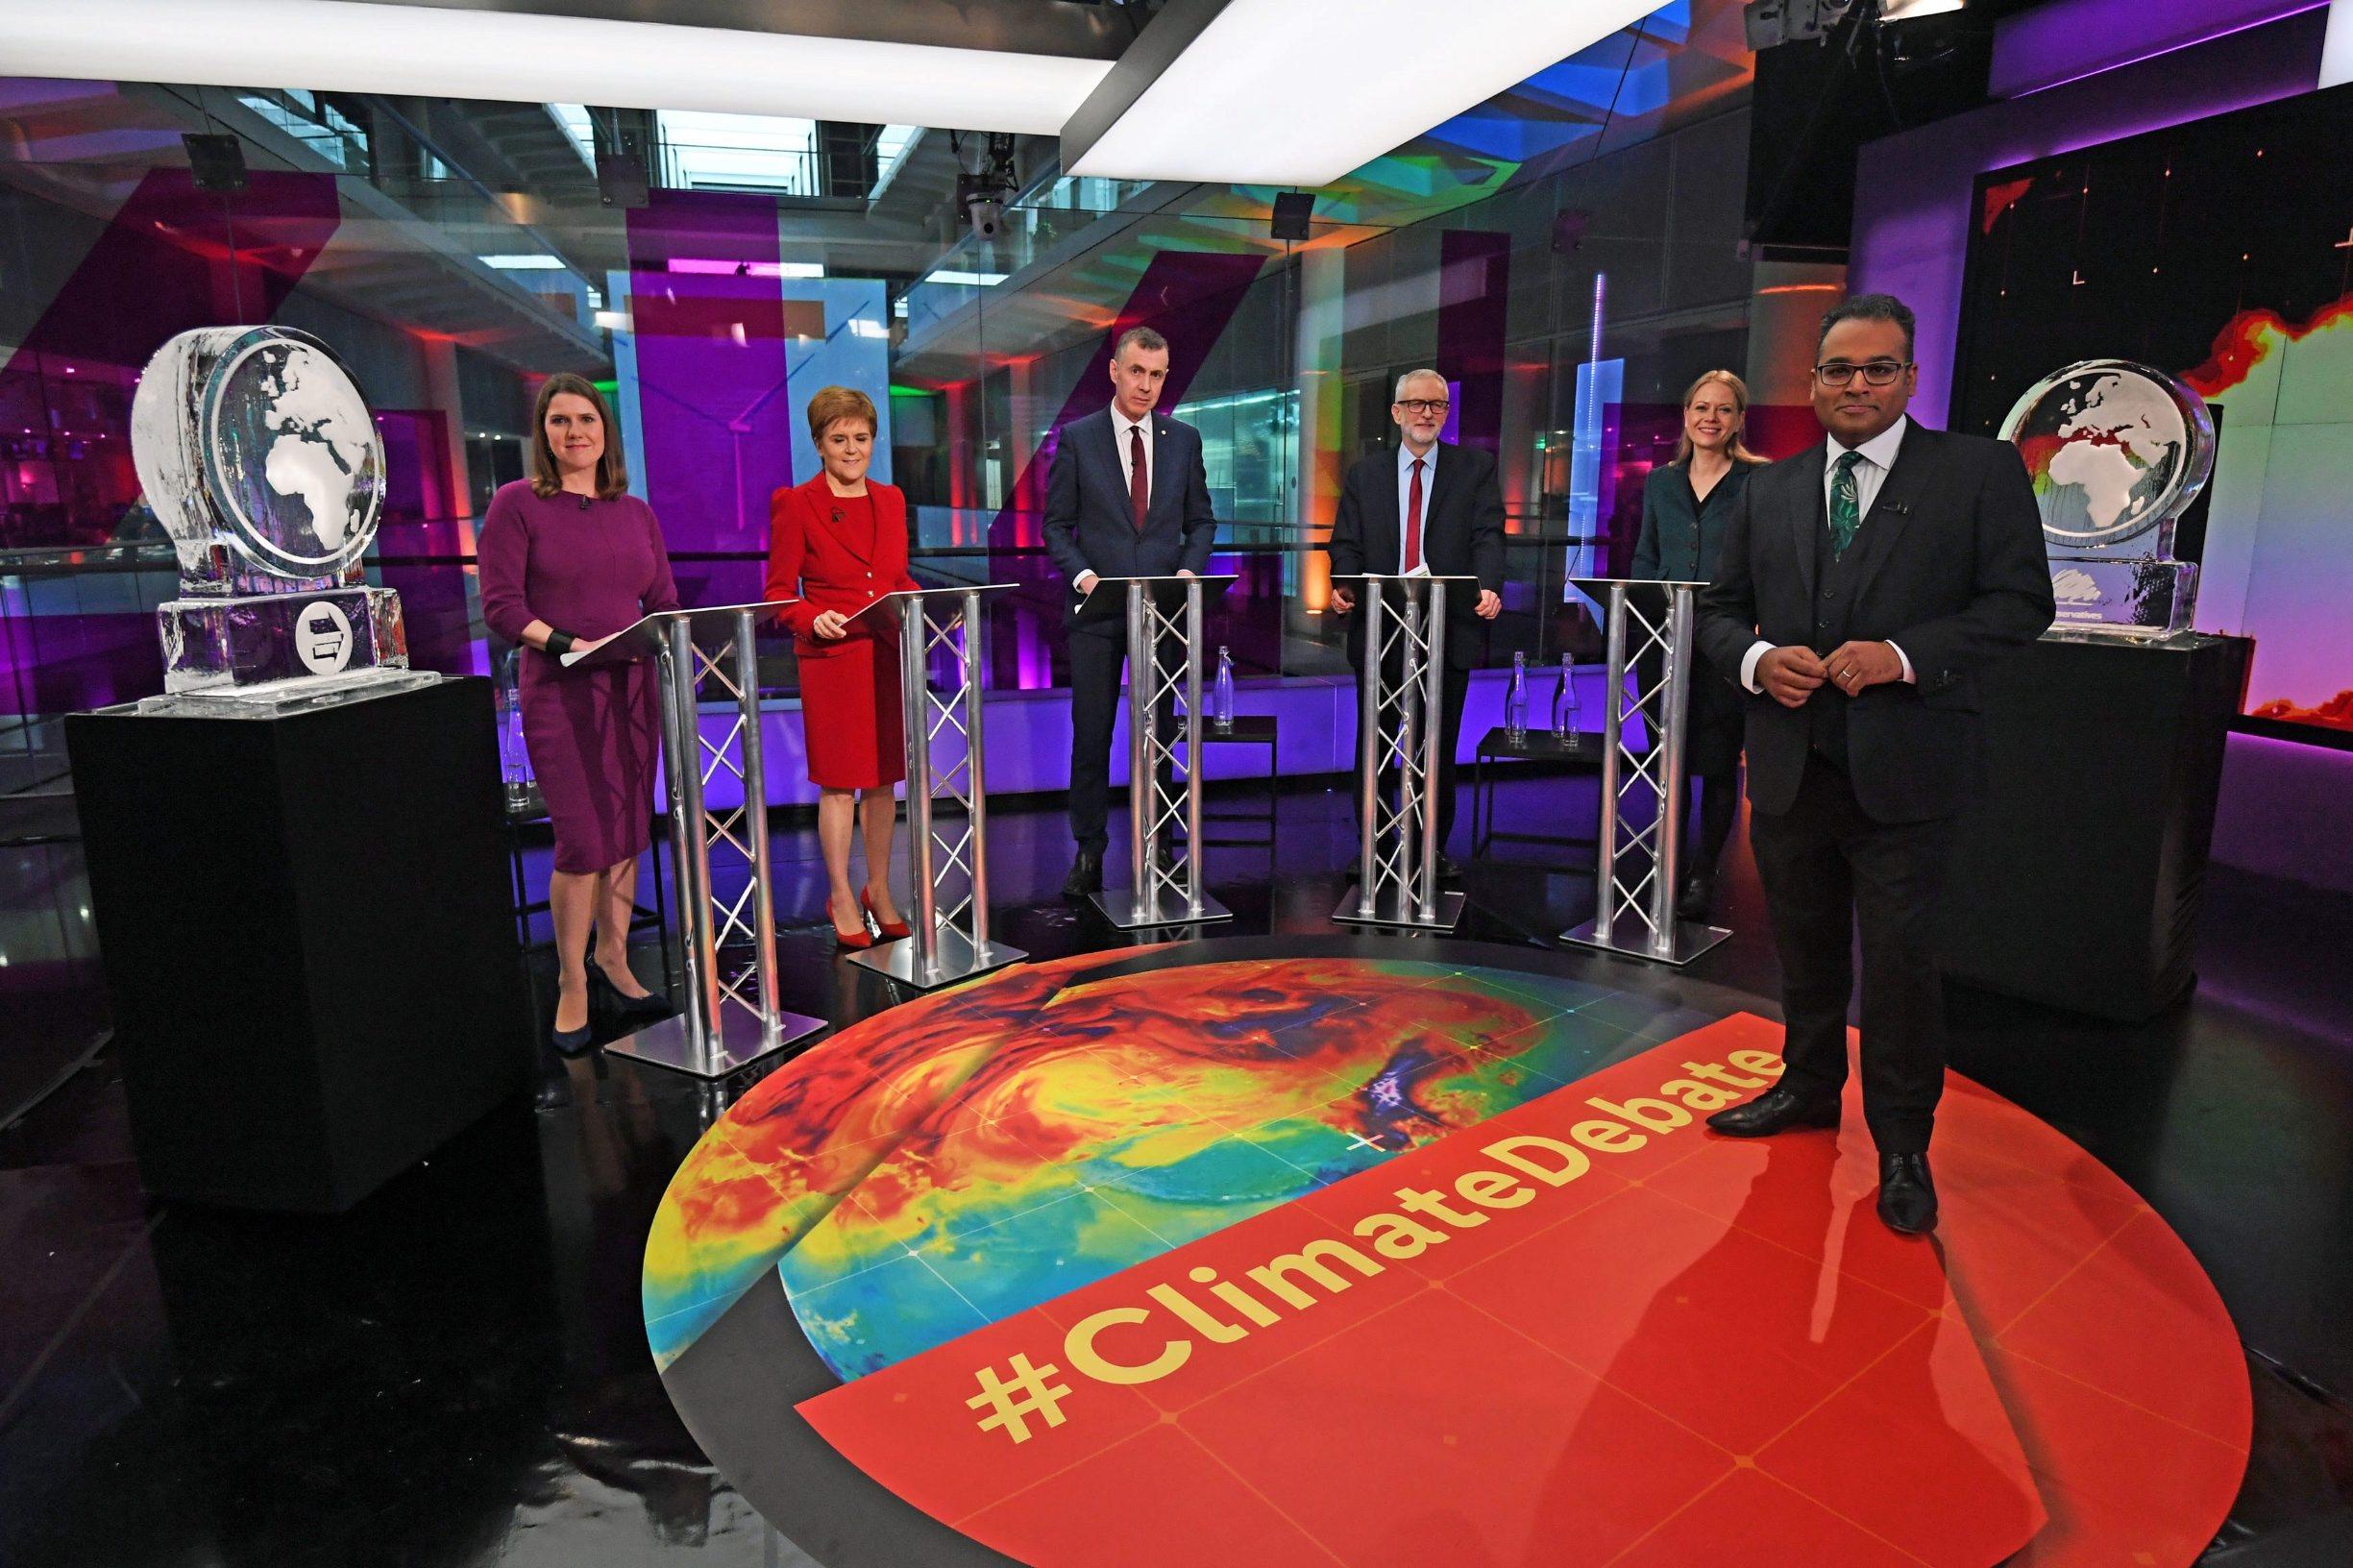 Krishnan Guru-Murthy, Jo Swinson, Nicola Sturgeon, Adam Price, Jeremy Corbyn, Sian Berry i ledene skulpture umjesto Faragea i Johnsona